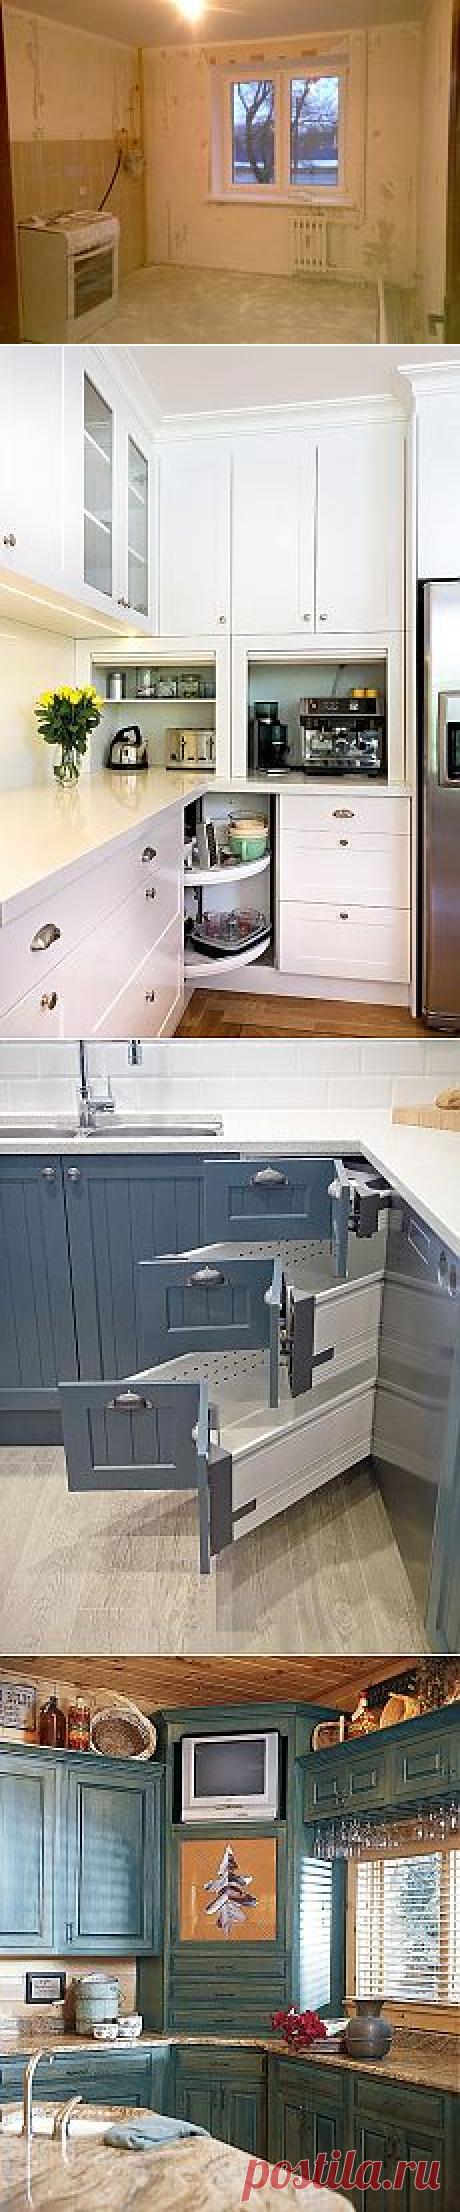 Search on Postila: angular kitchens